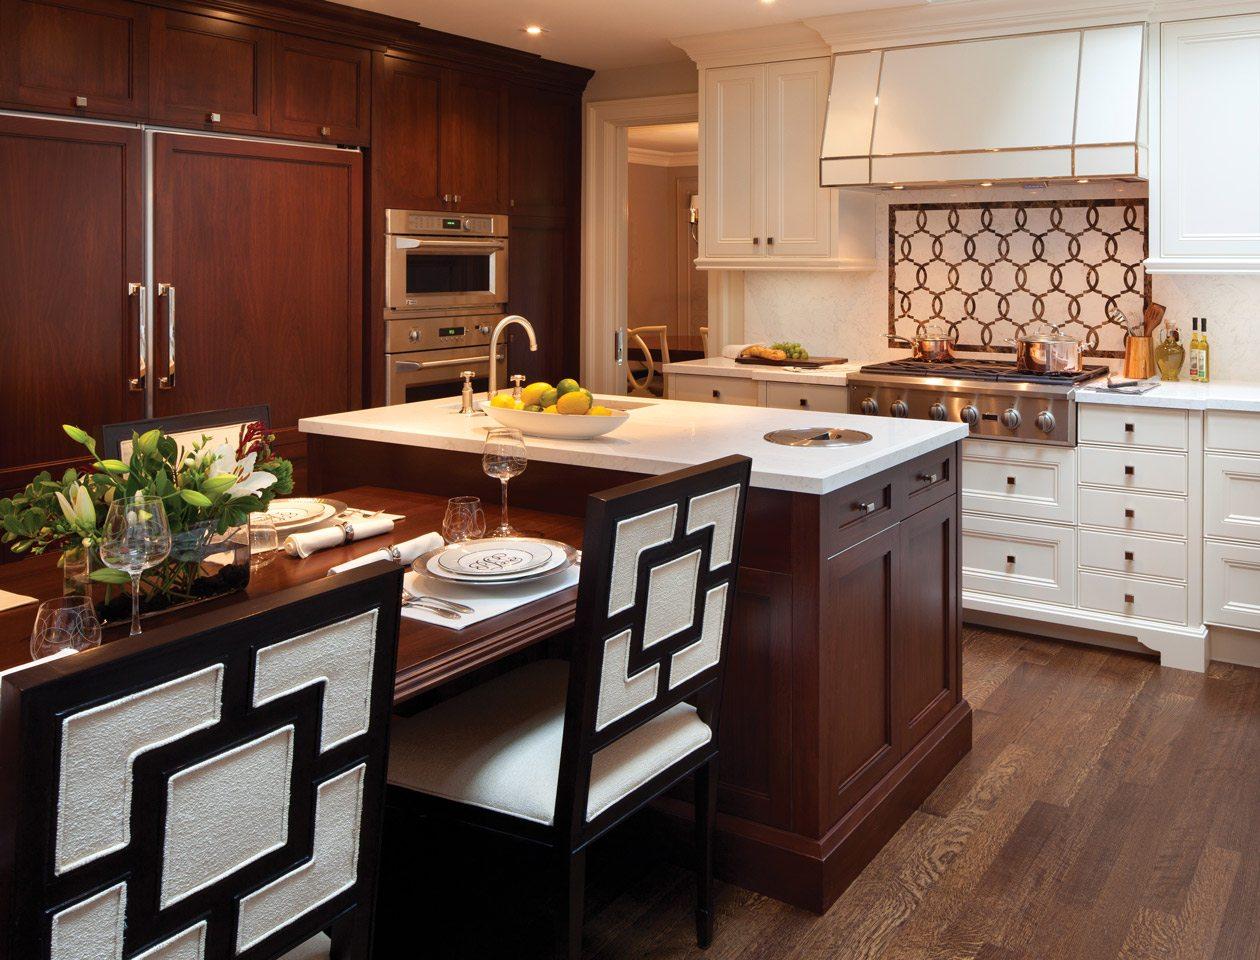 Modern kitchen with white quarts countertop